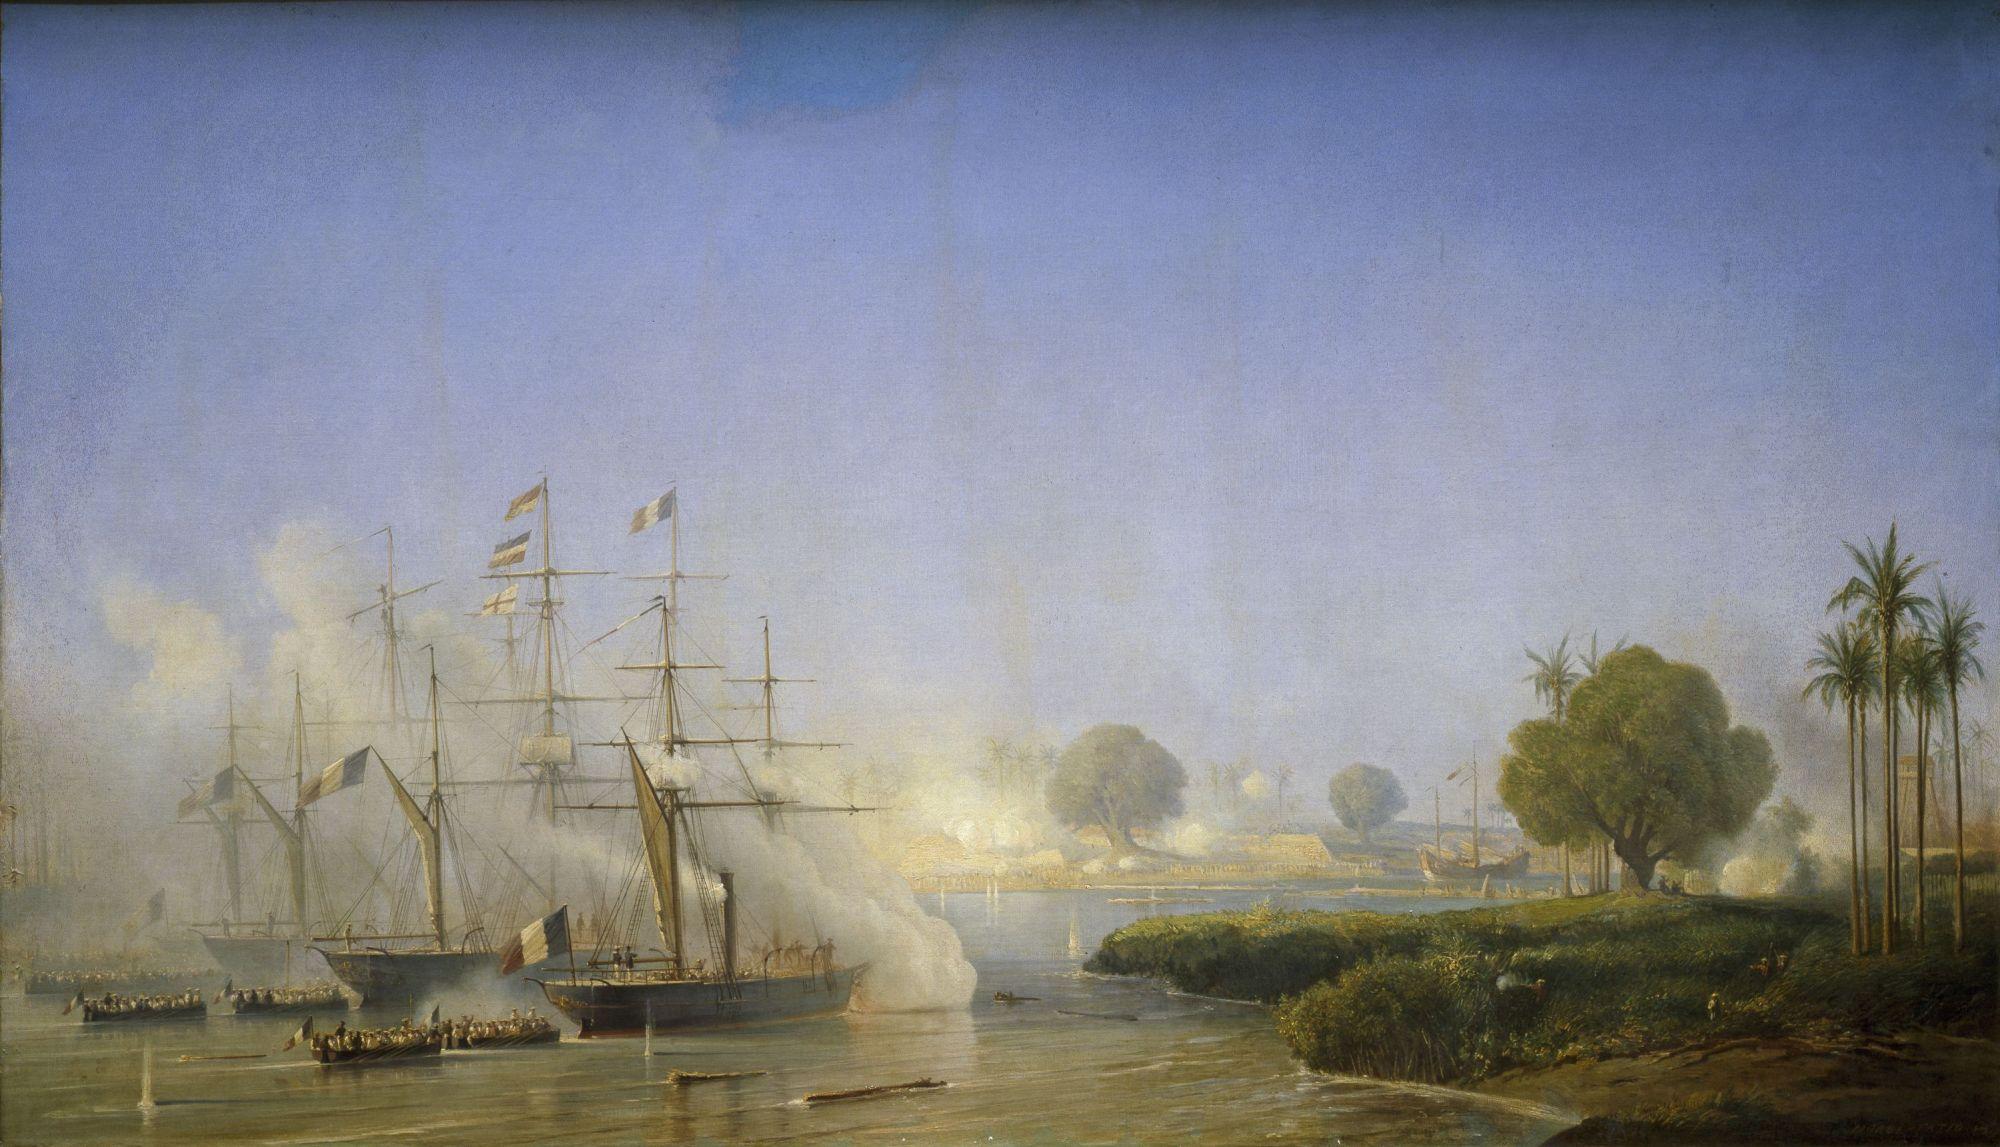 http://upload.wikimedia.org/wikipedia/commons/c/ce/Prise_de_Saigon_18_Fevrier_1859_Antoine_Morel-Fatio.jpg